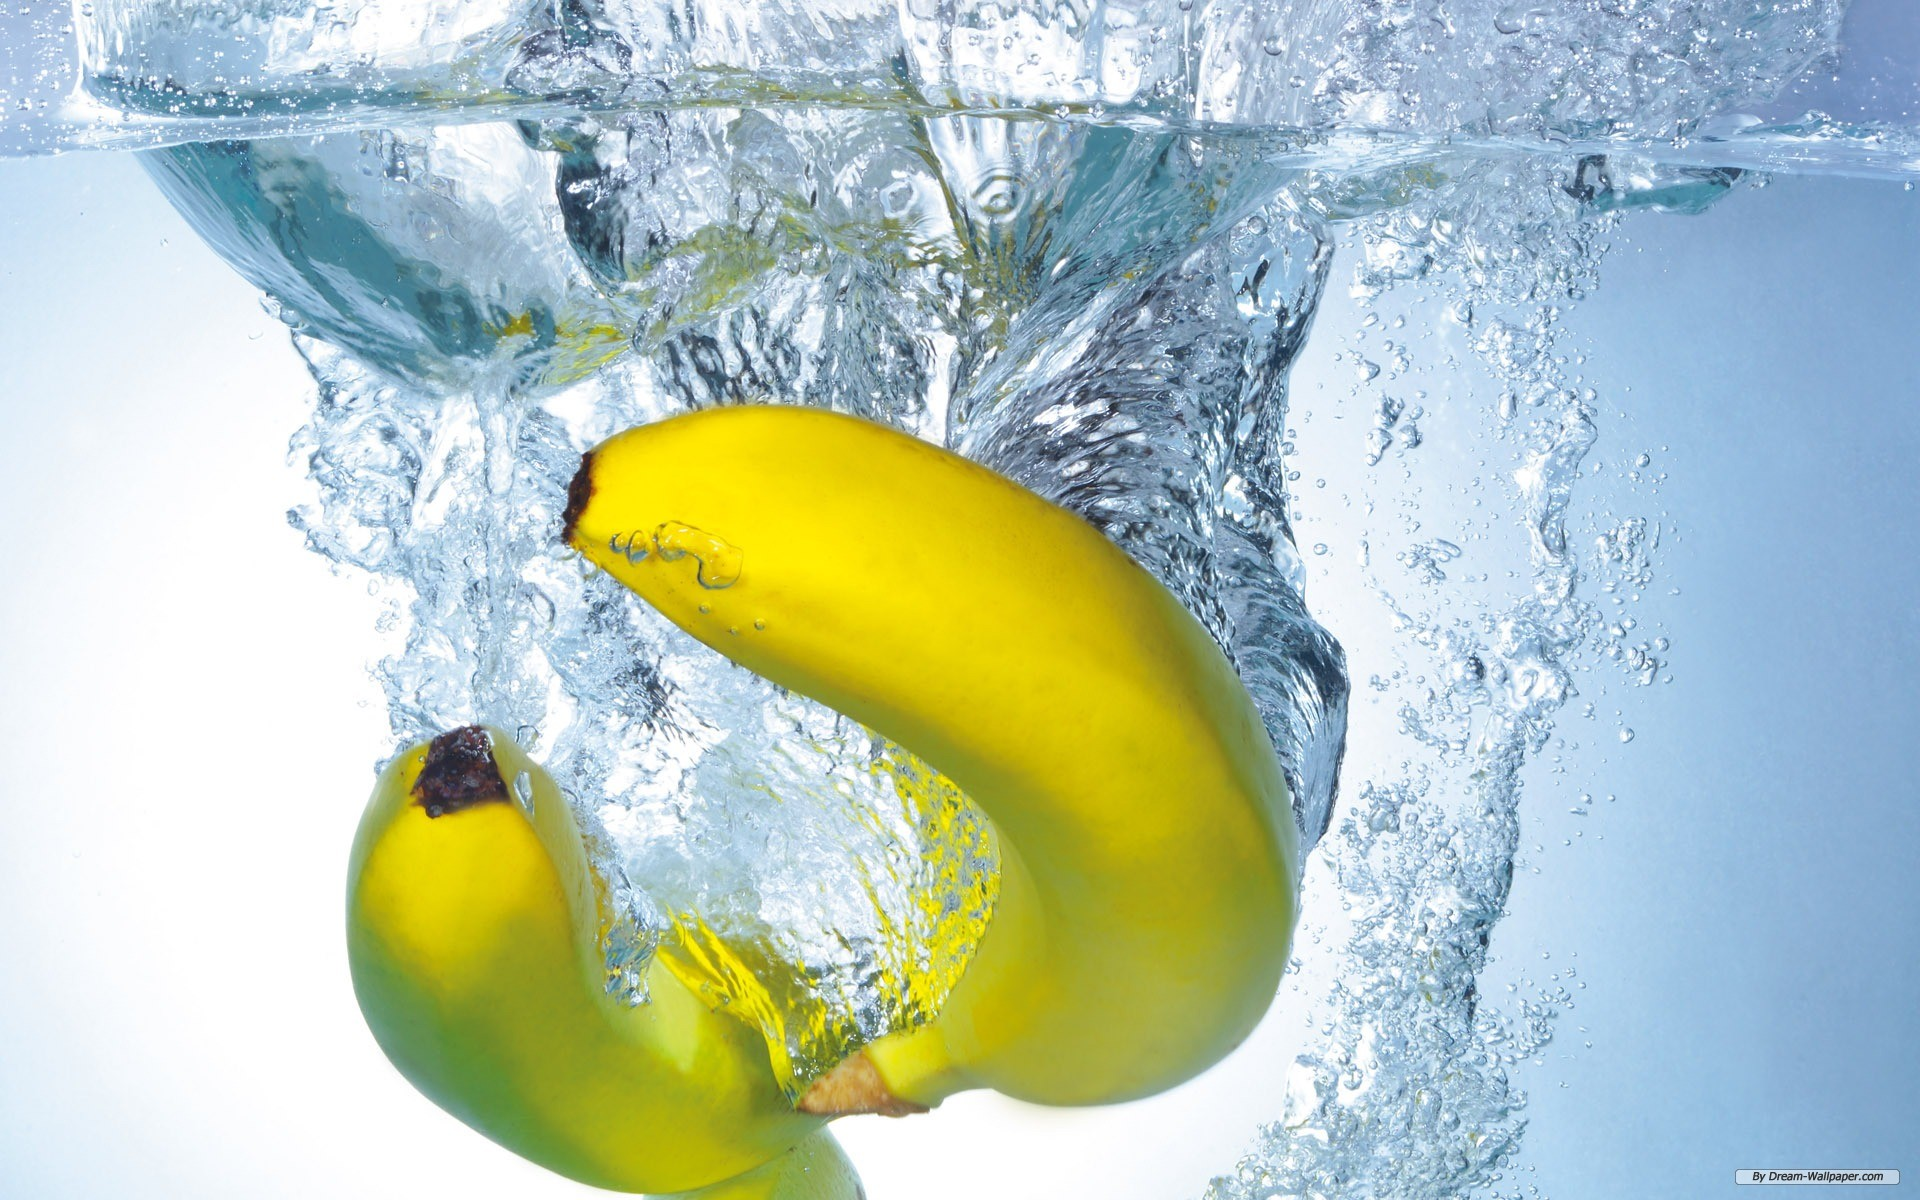 wallpaper dynamic backgrounds desktop fruit photography 1920x1200 1920x1200